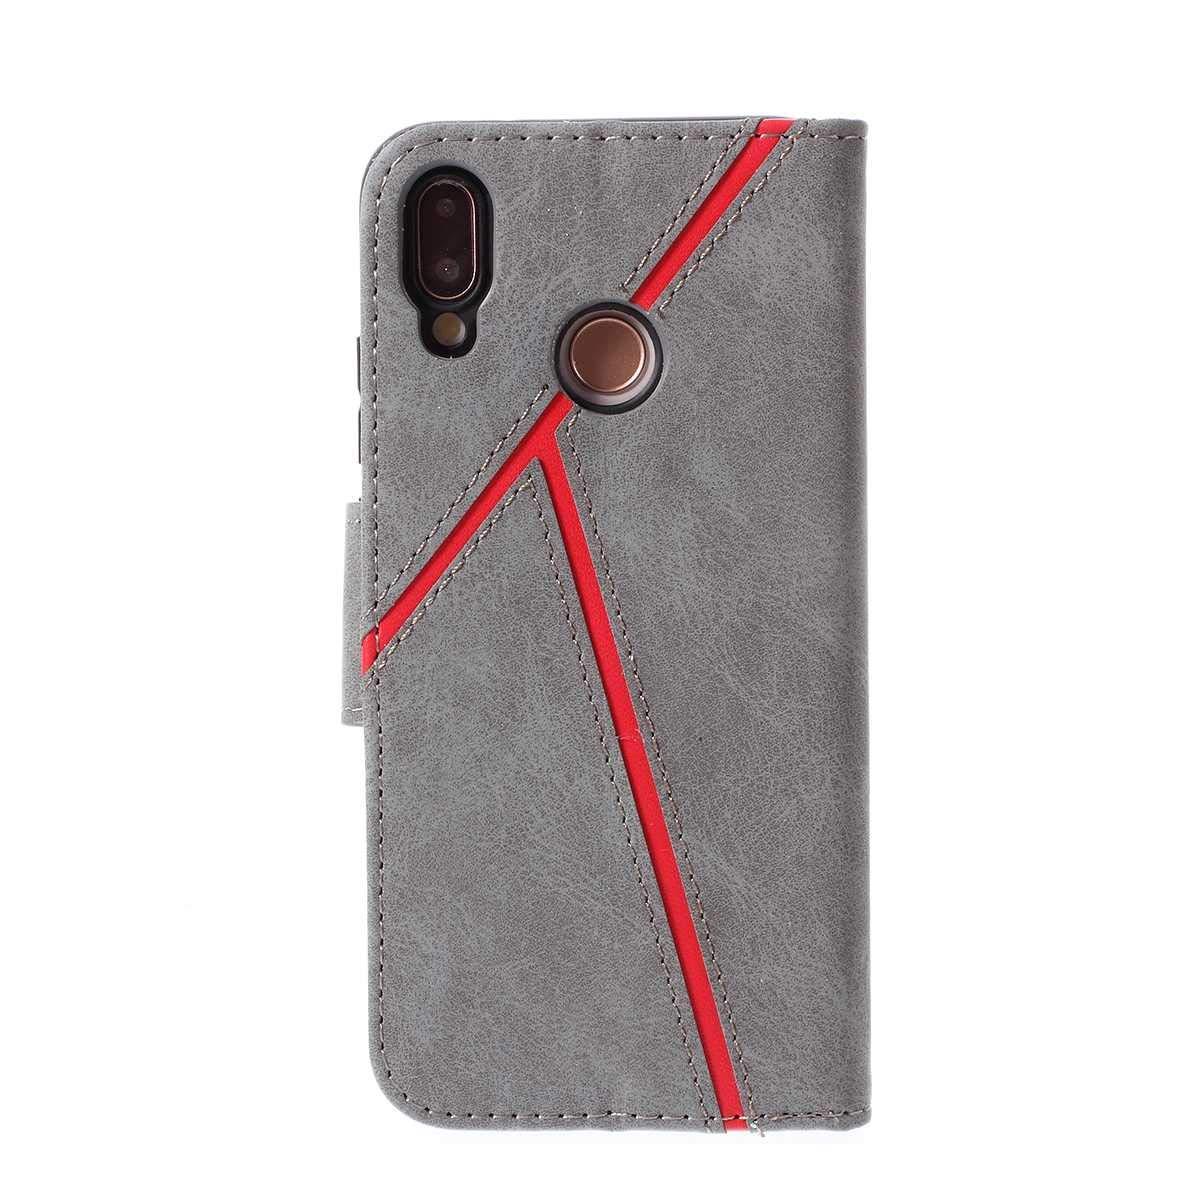 Nero DENDICO Cover Huawei P20 Lite Slim Magnetica Custodia a ...